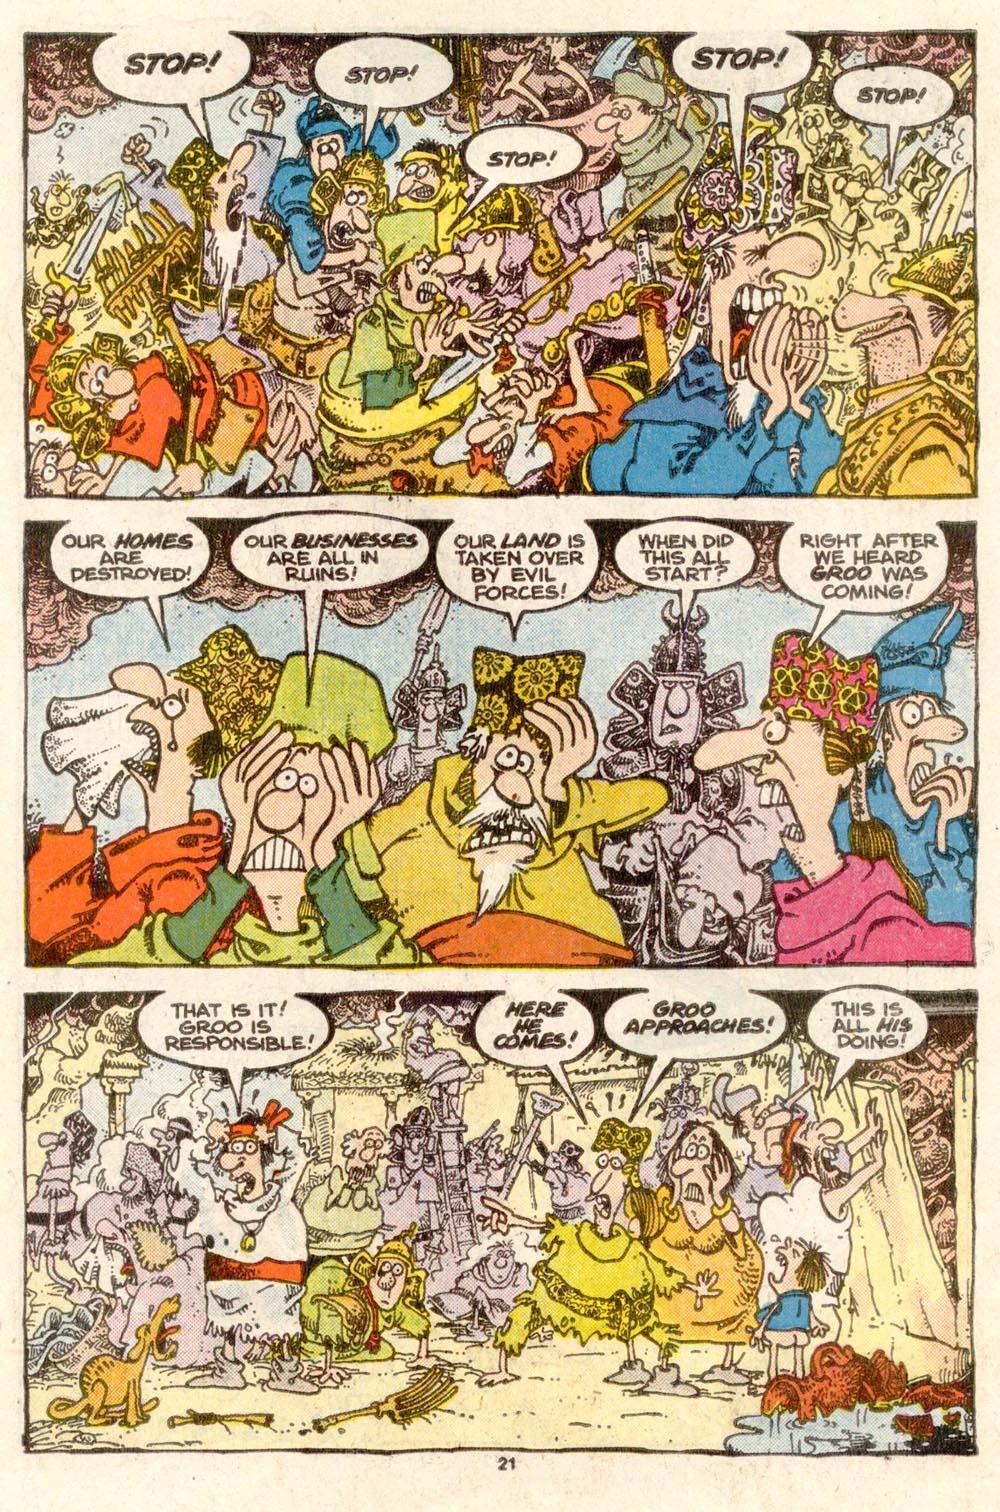 Read online Sergio Aragonés Groo the Wanderer comic -  Issue #37 - 23